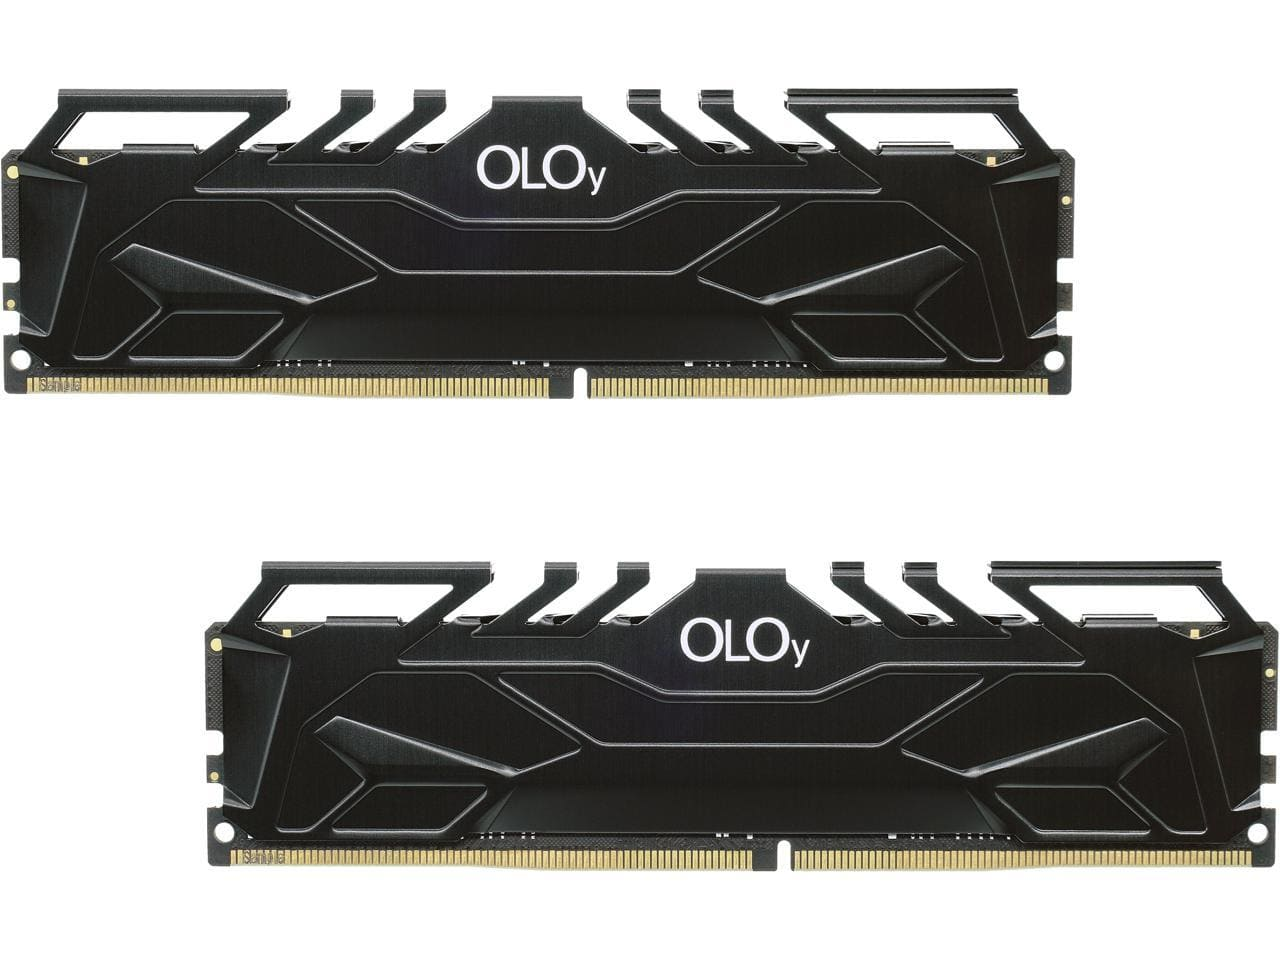 OLOy 32GB (2 x 16GB) 3000MHz DDR4 $92.99